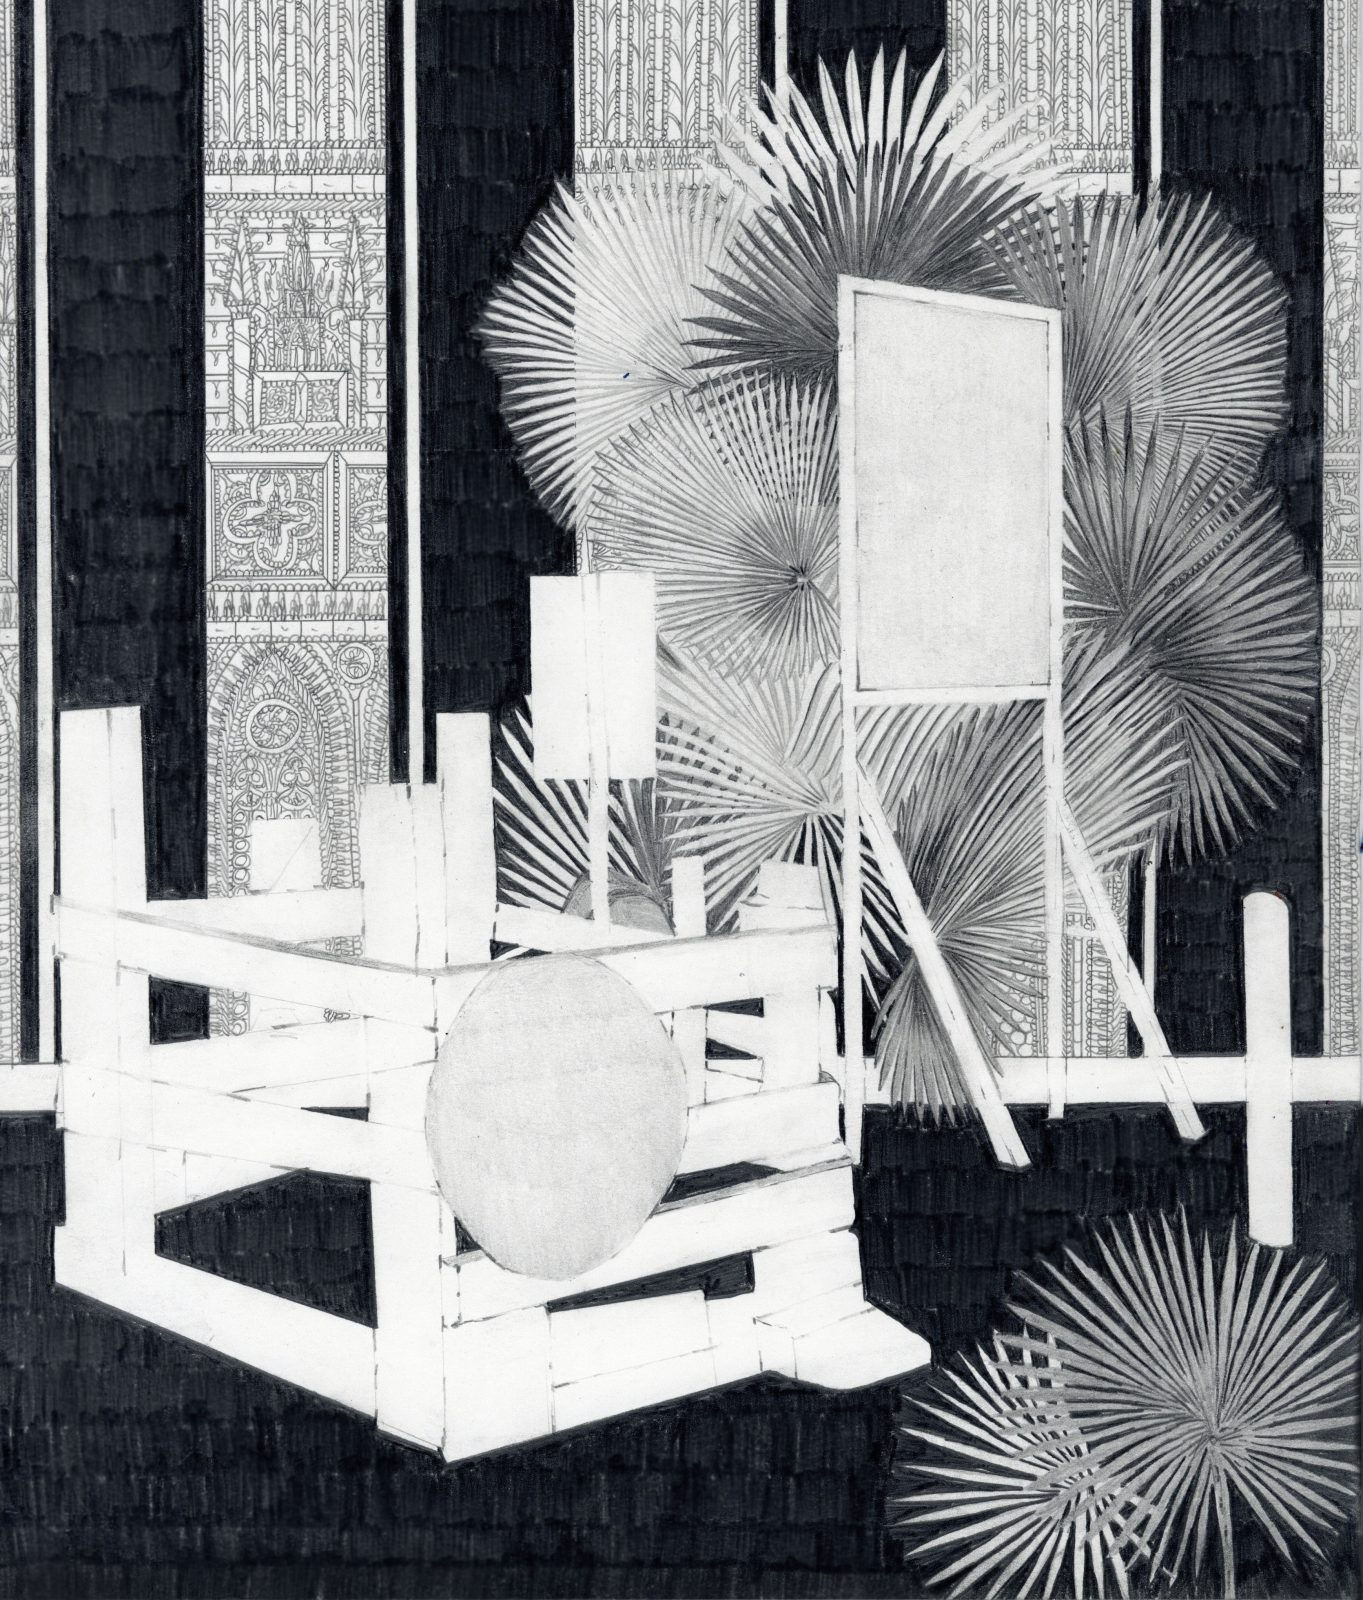 NÖ Waldviertel Galerie Kunst - Patrick Roman Scherer